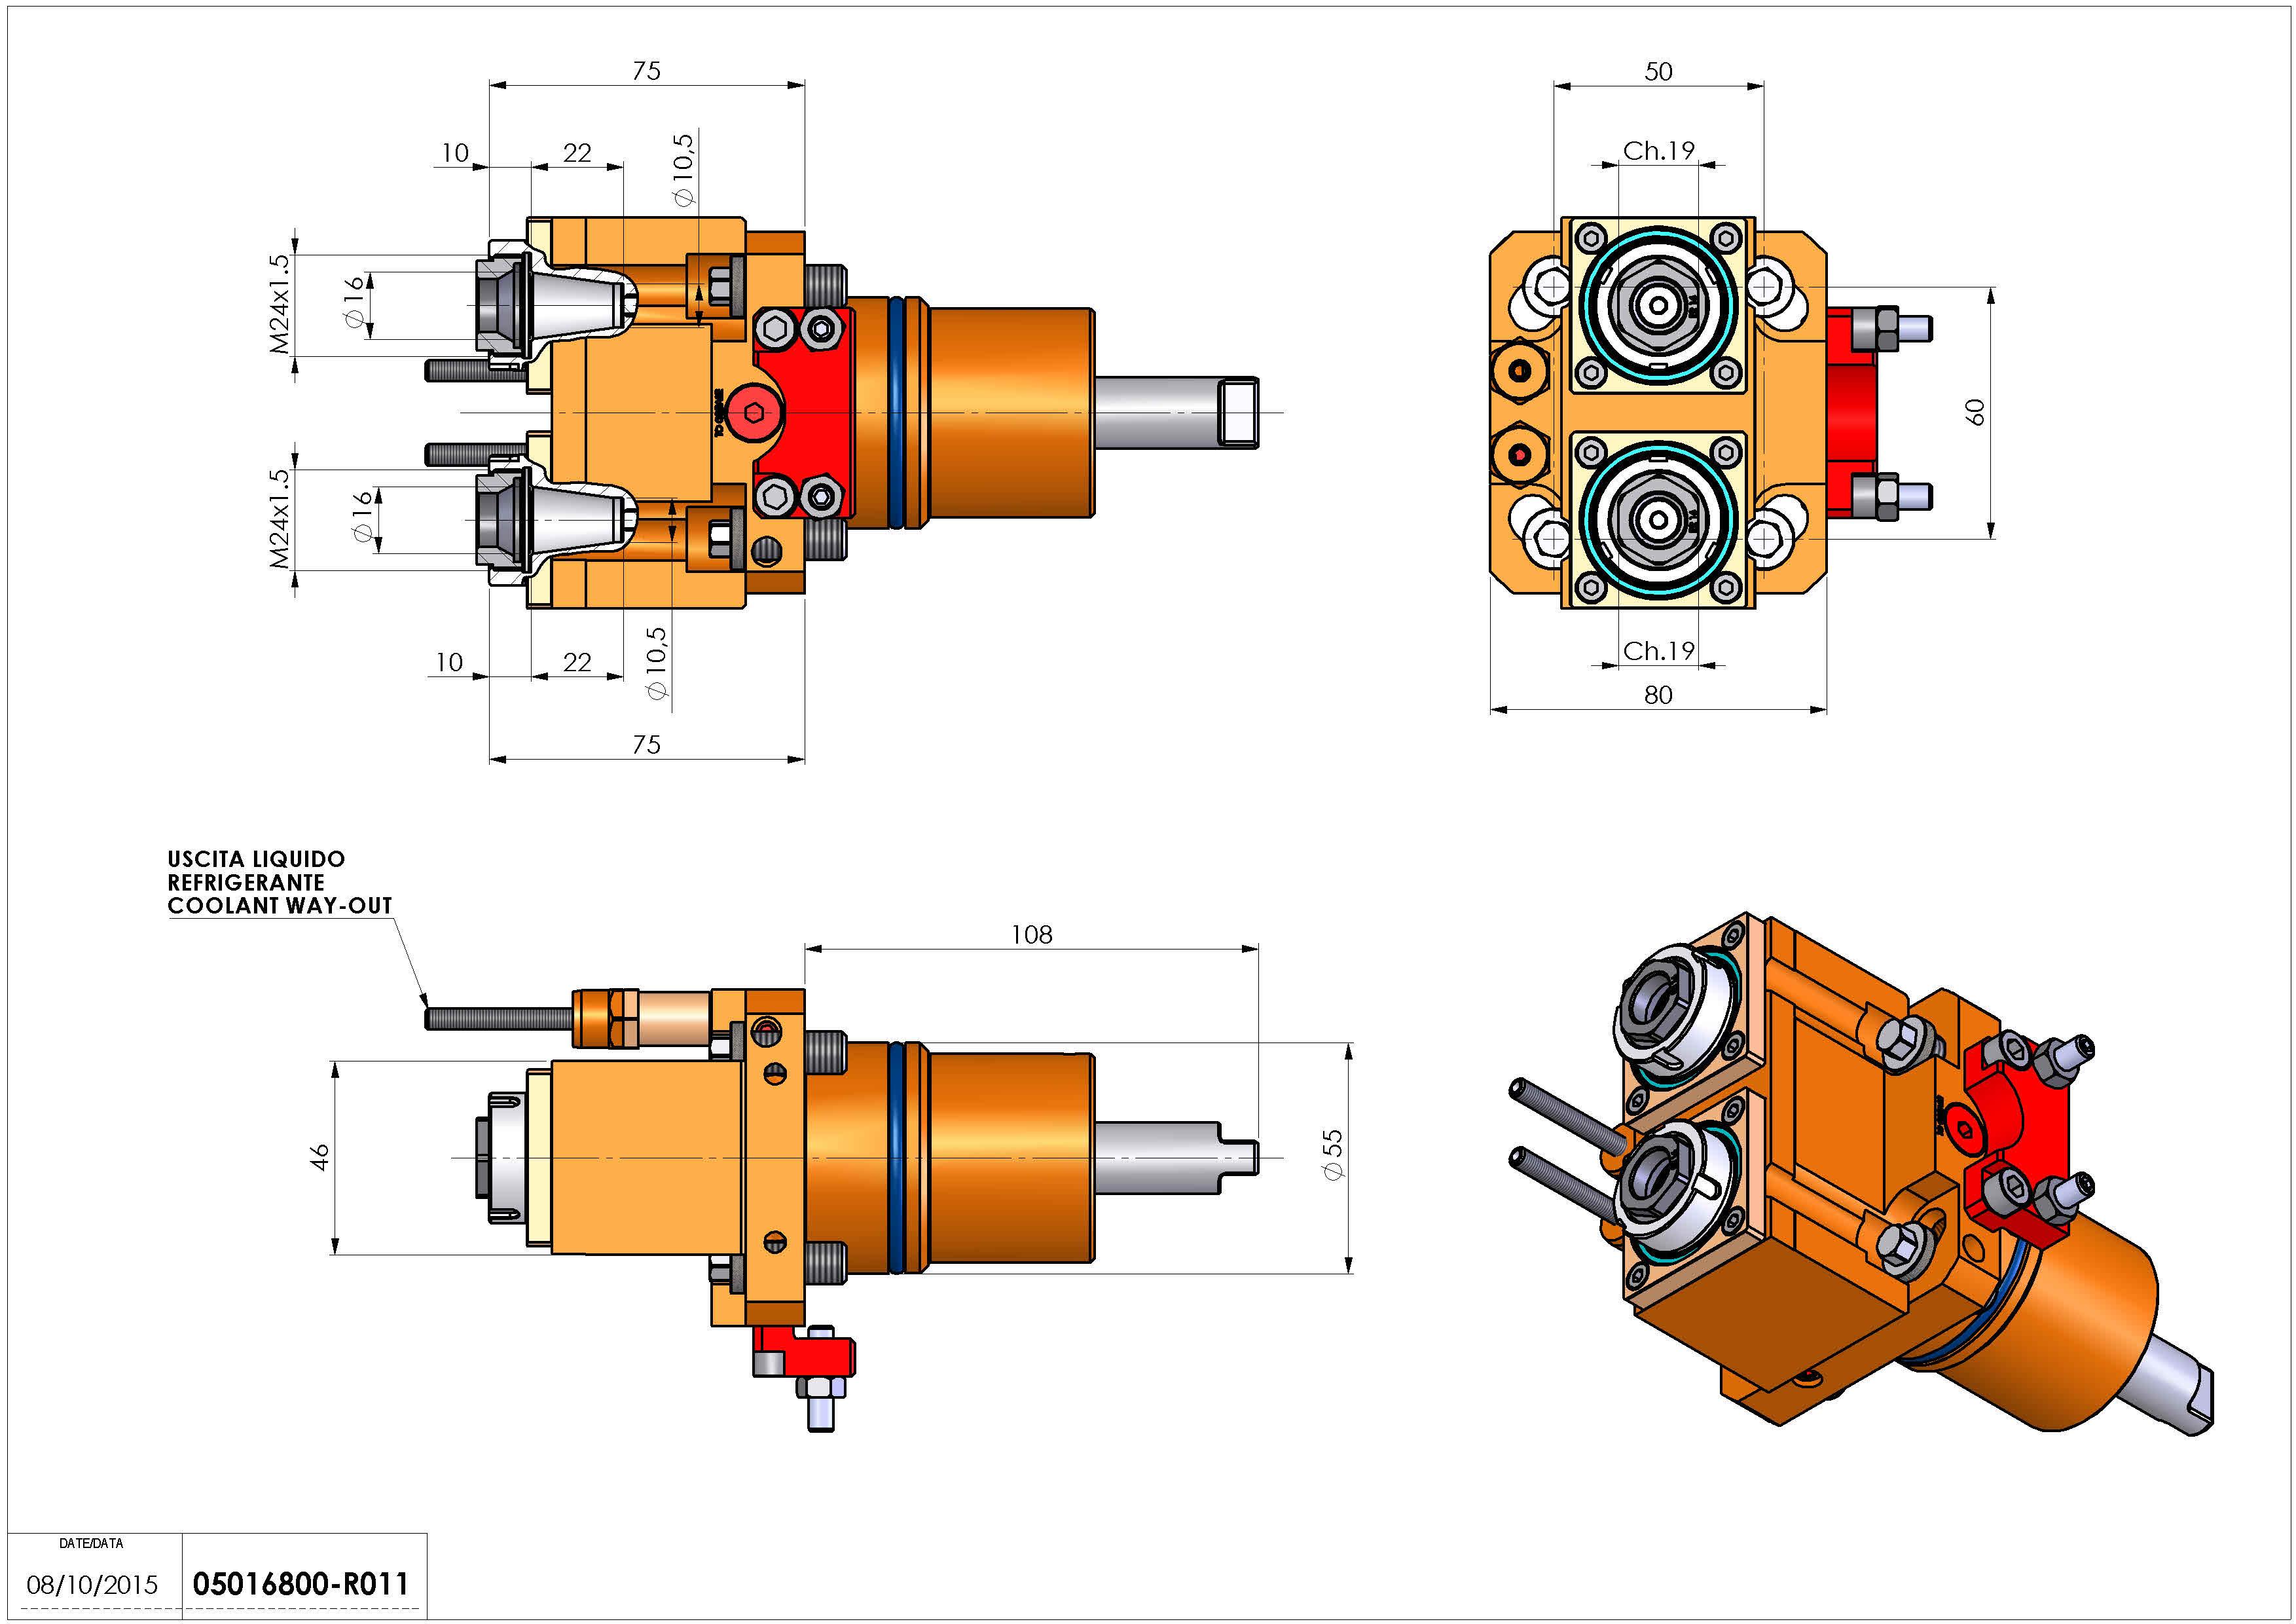 Technical image - LT-S2 D55 ER16F-16F 1:1 H75 NK.